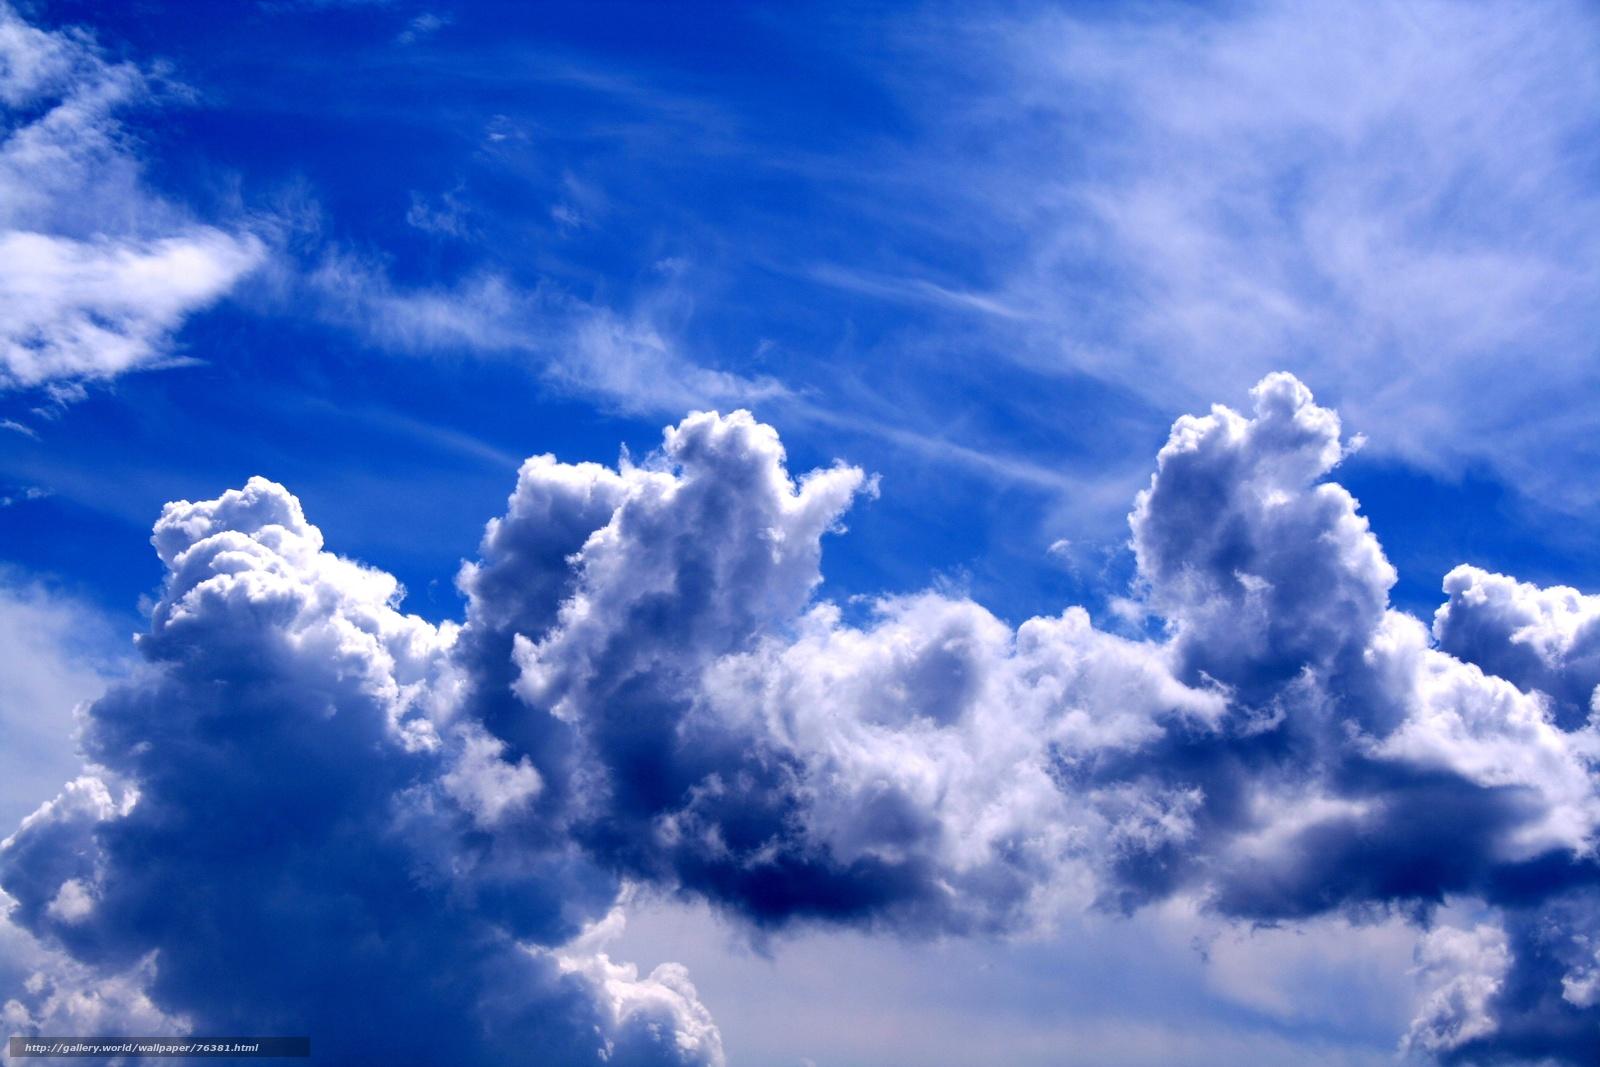 Descargar gratis las nubes paisaje papel pintado cielo - Papel pintado paisajes ...